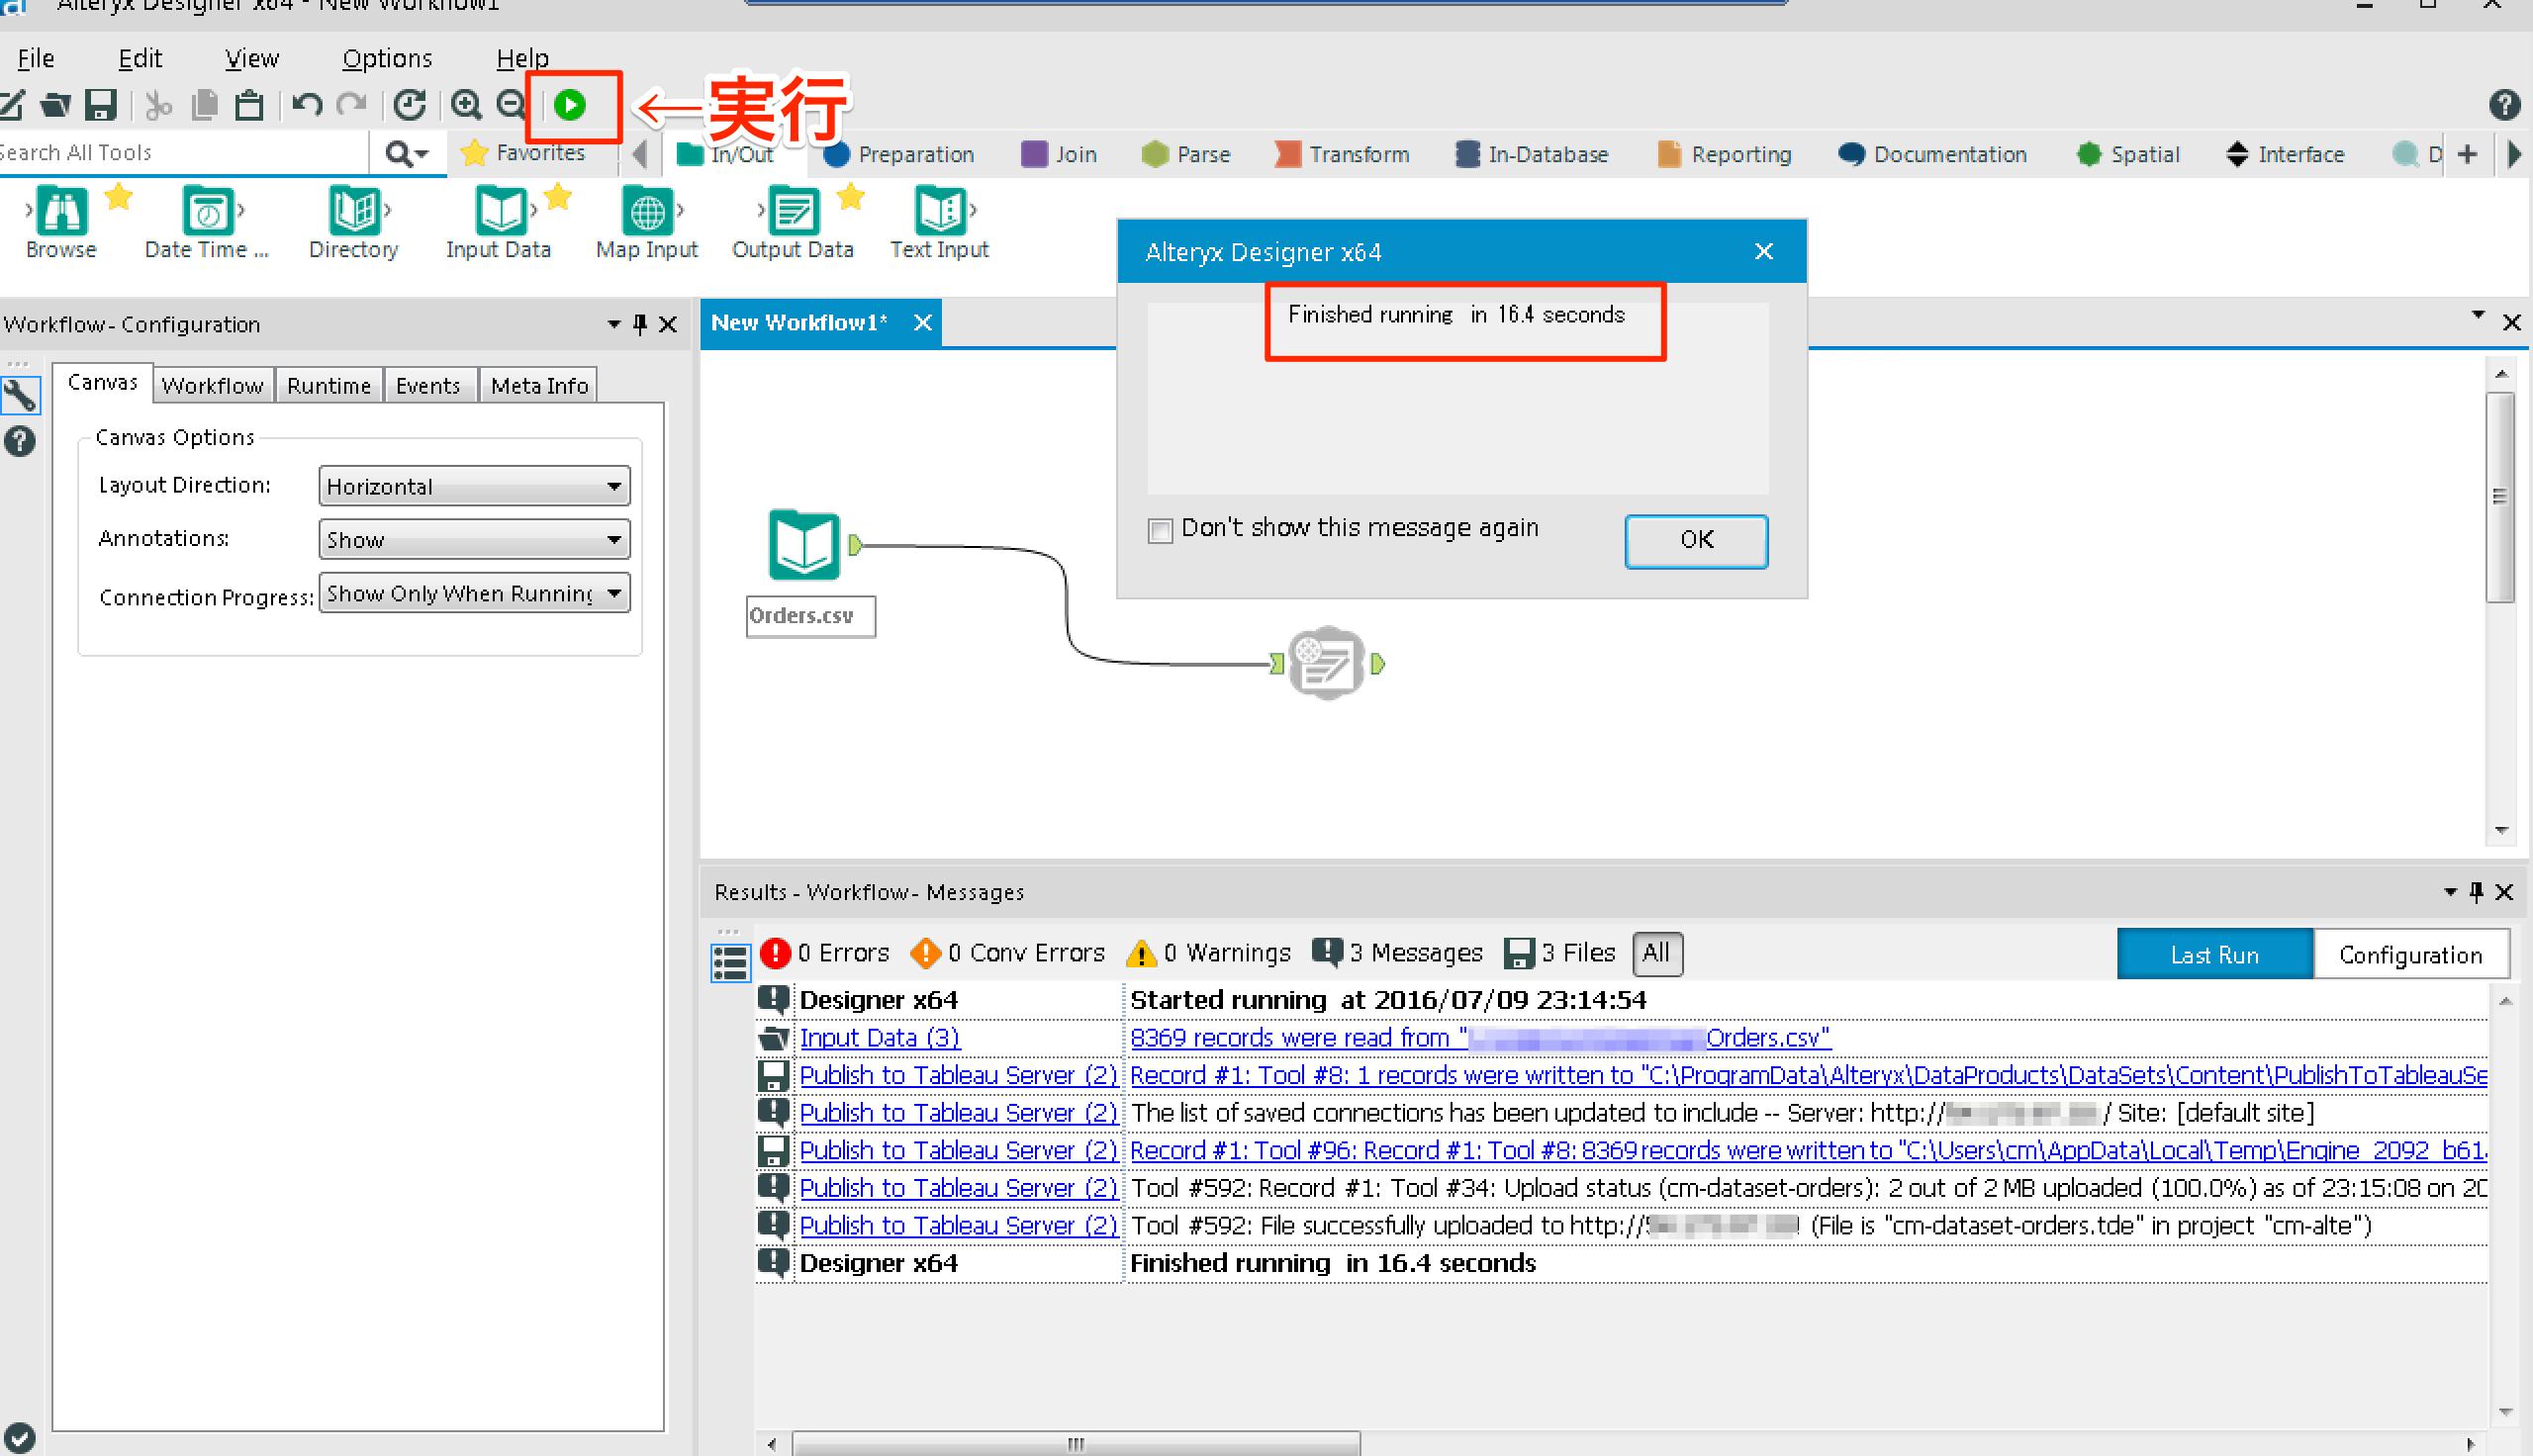 alteryx-workflow-tableau-server-publish_07